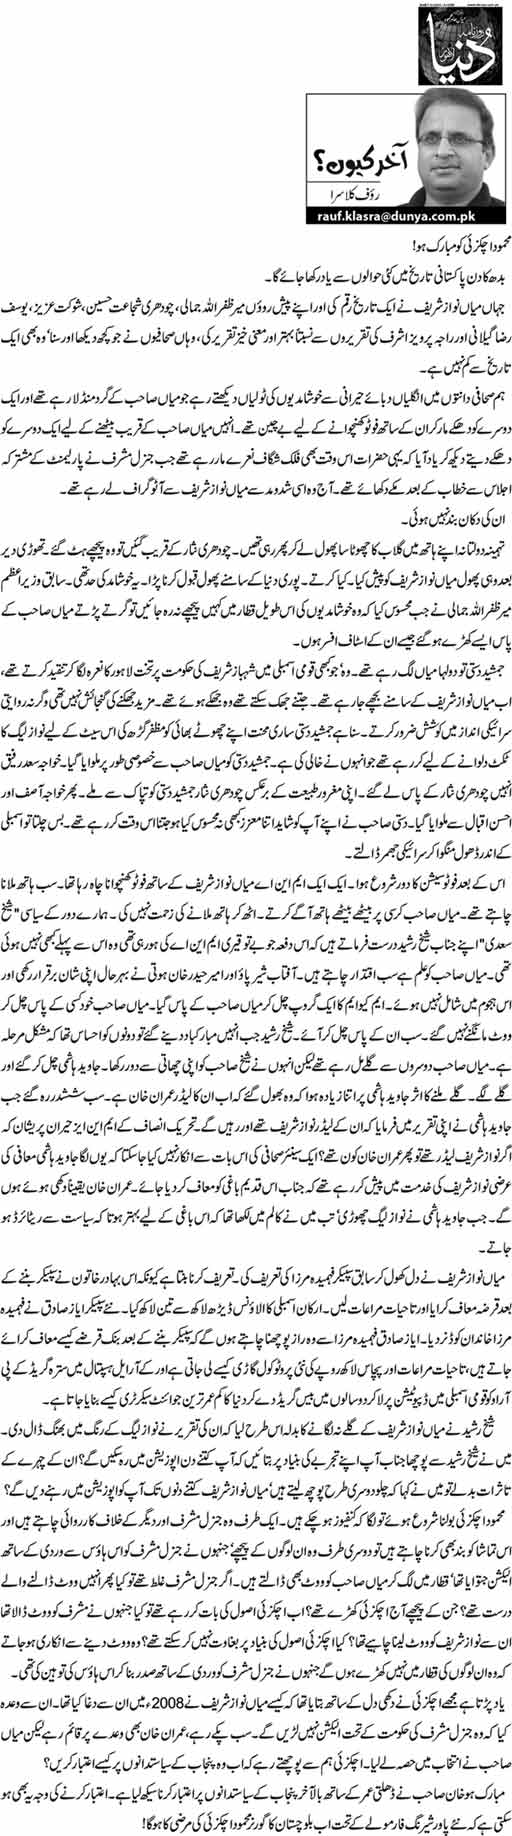 Mehmood Khan Achakzai Ko Mubarak Ho! - Rauf Klasra